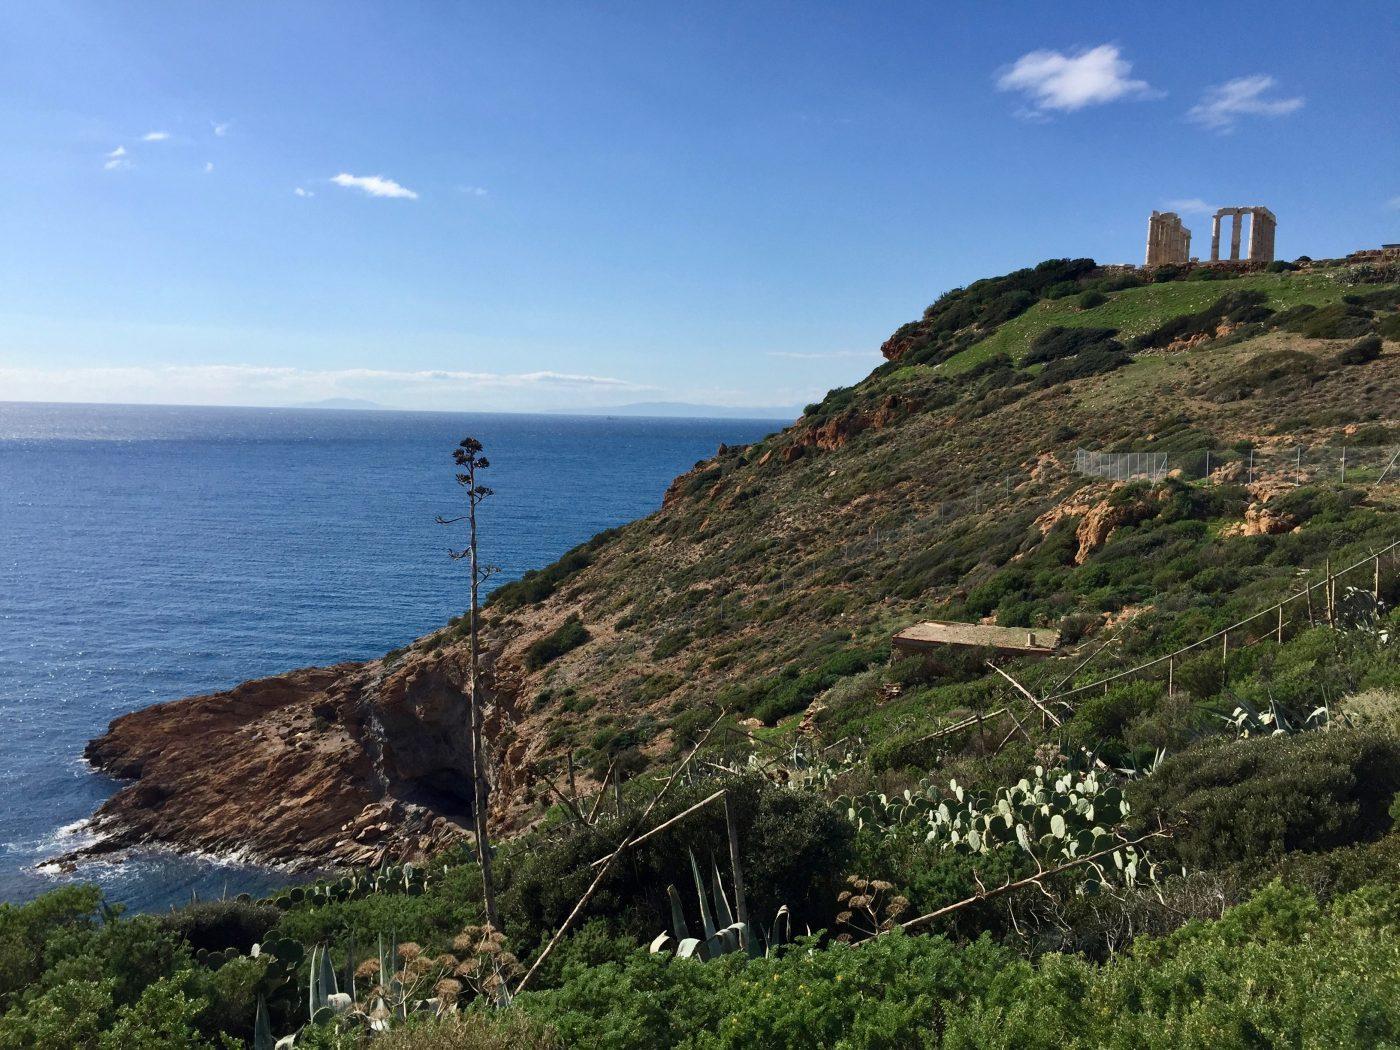 Sounio Lavrio Temple of Poseidon Athens Voice Guides